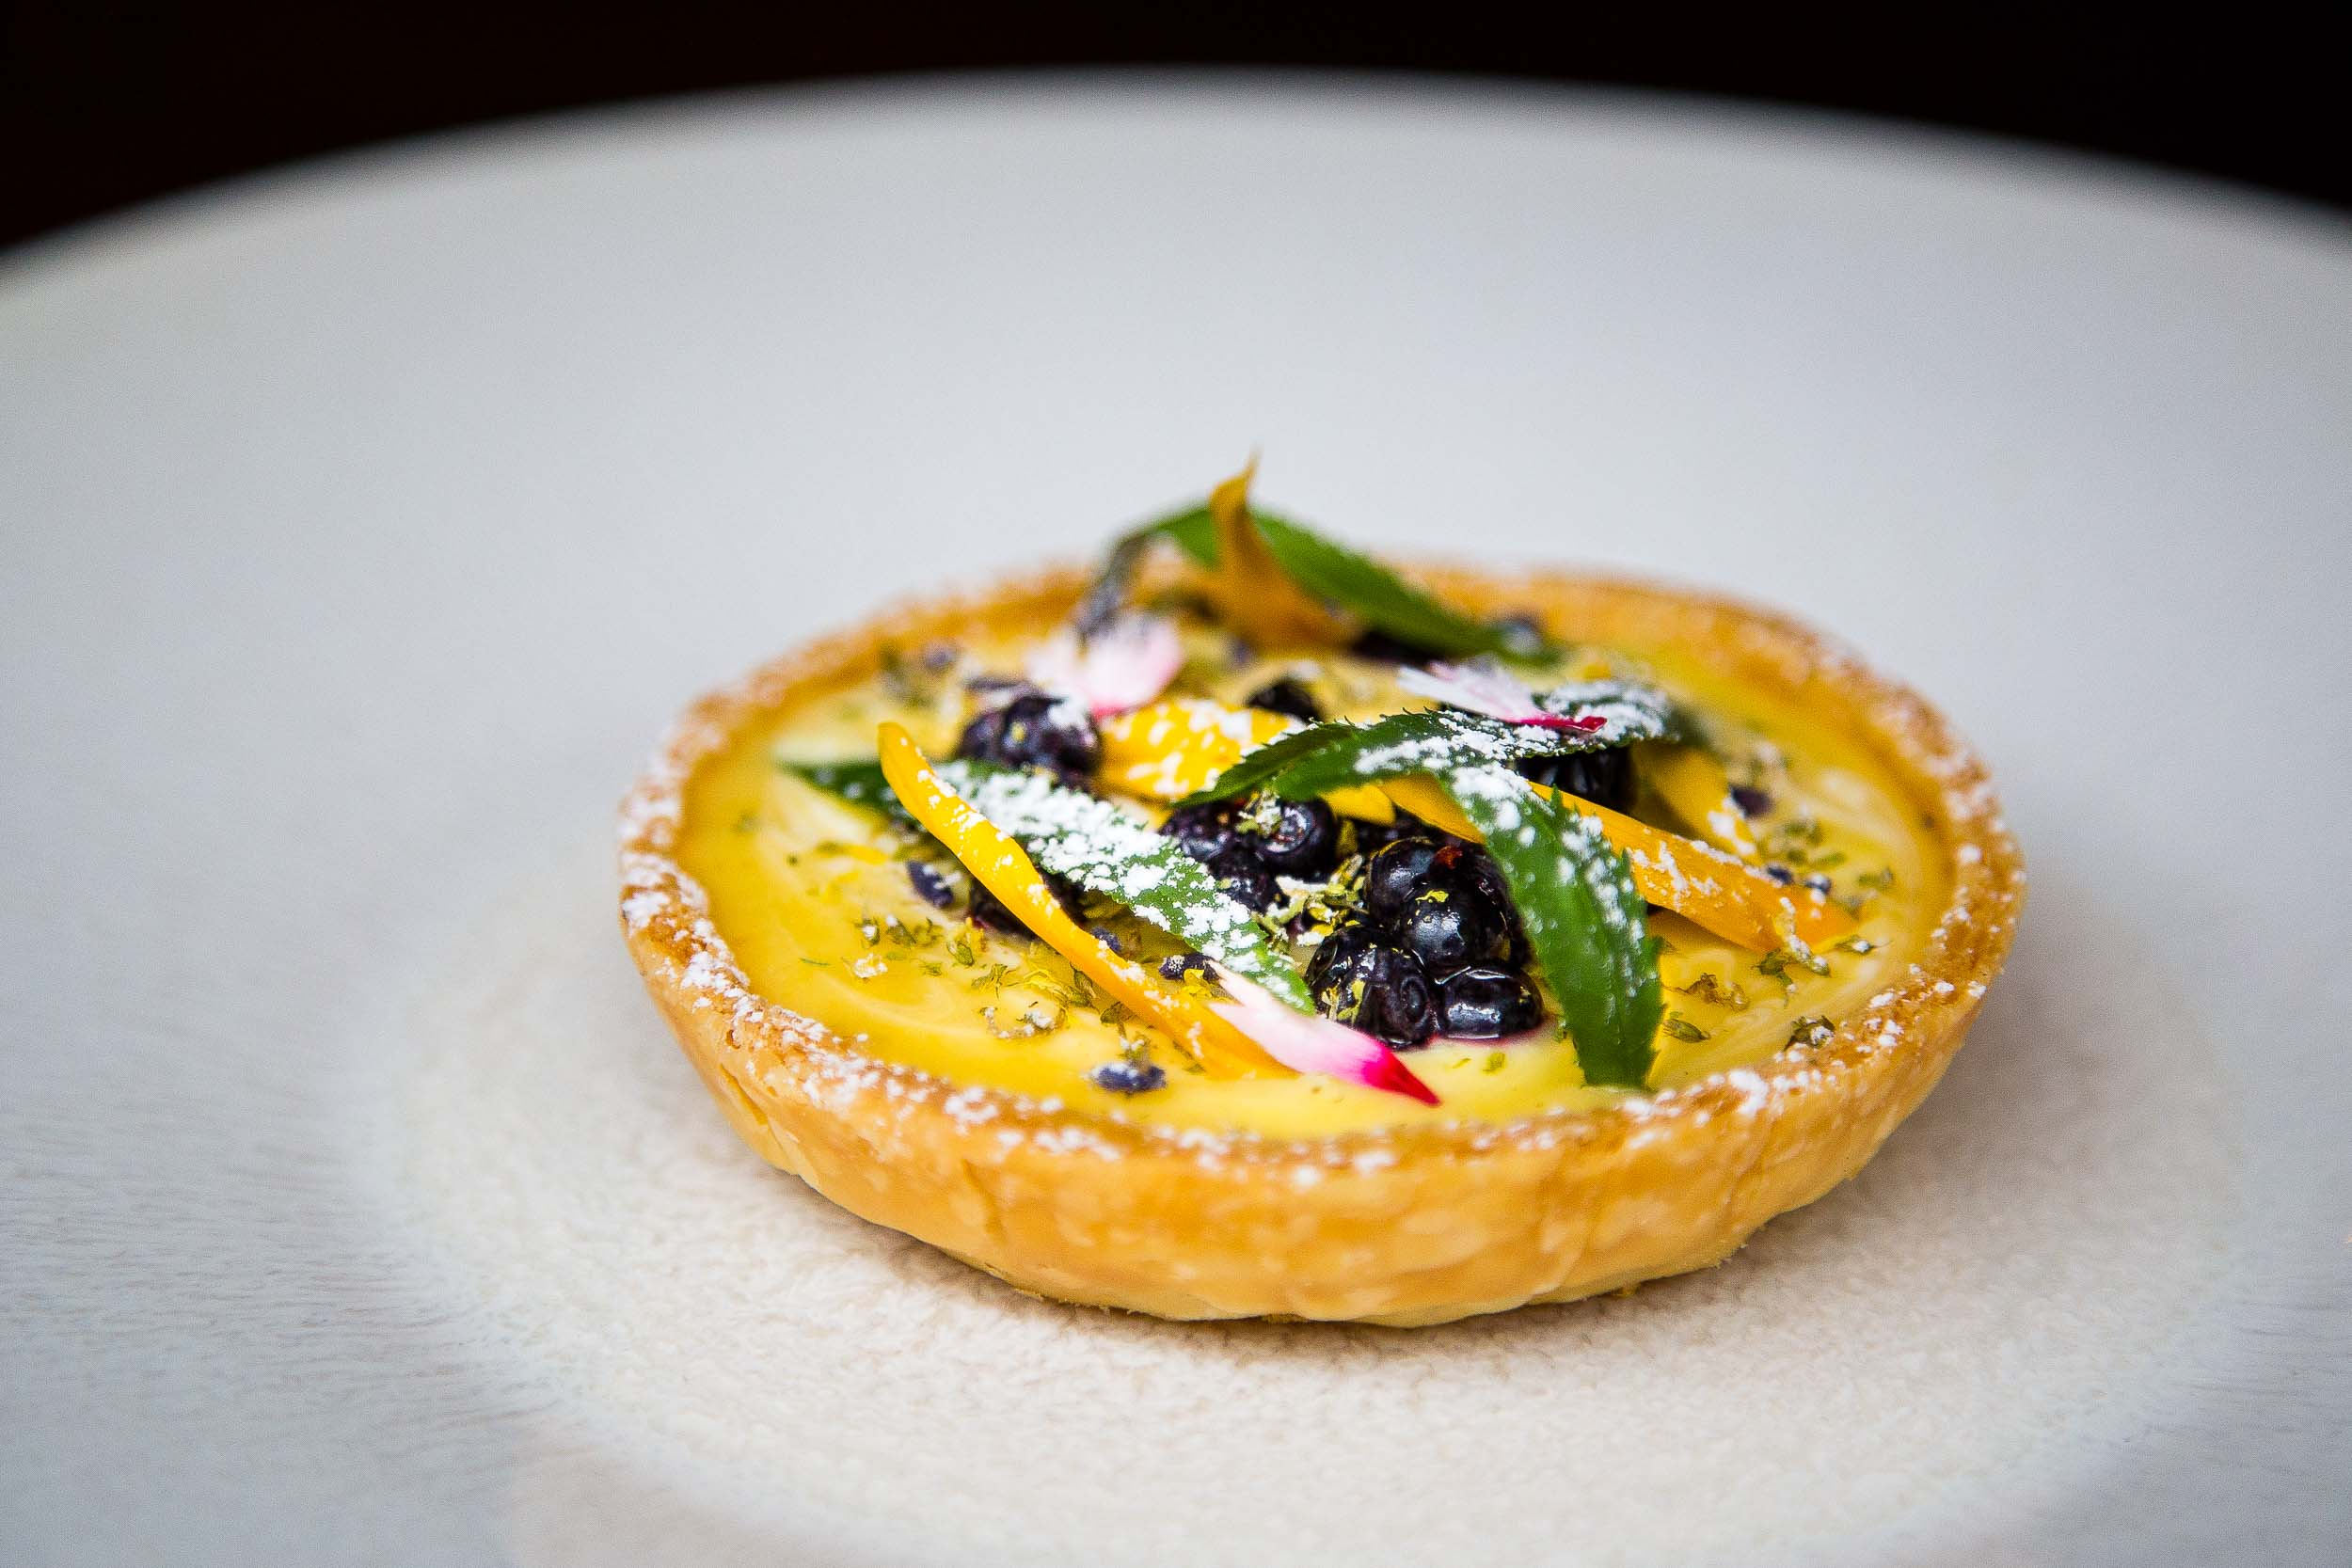 Lemon, Elderflower, and Creme Fraiche Tart with Wild Blueberries and Marigold Shoots